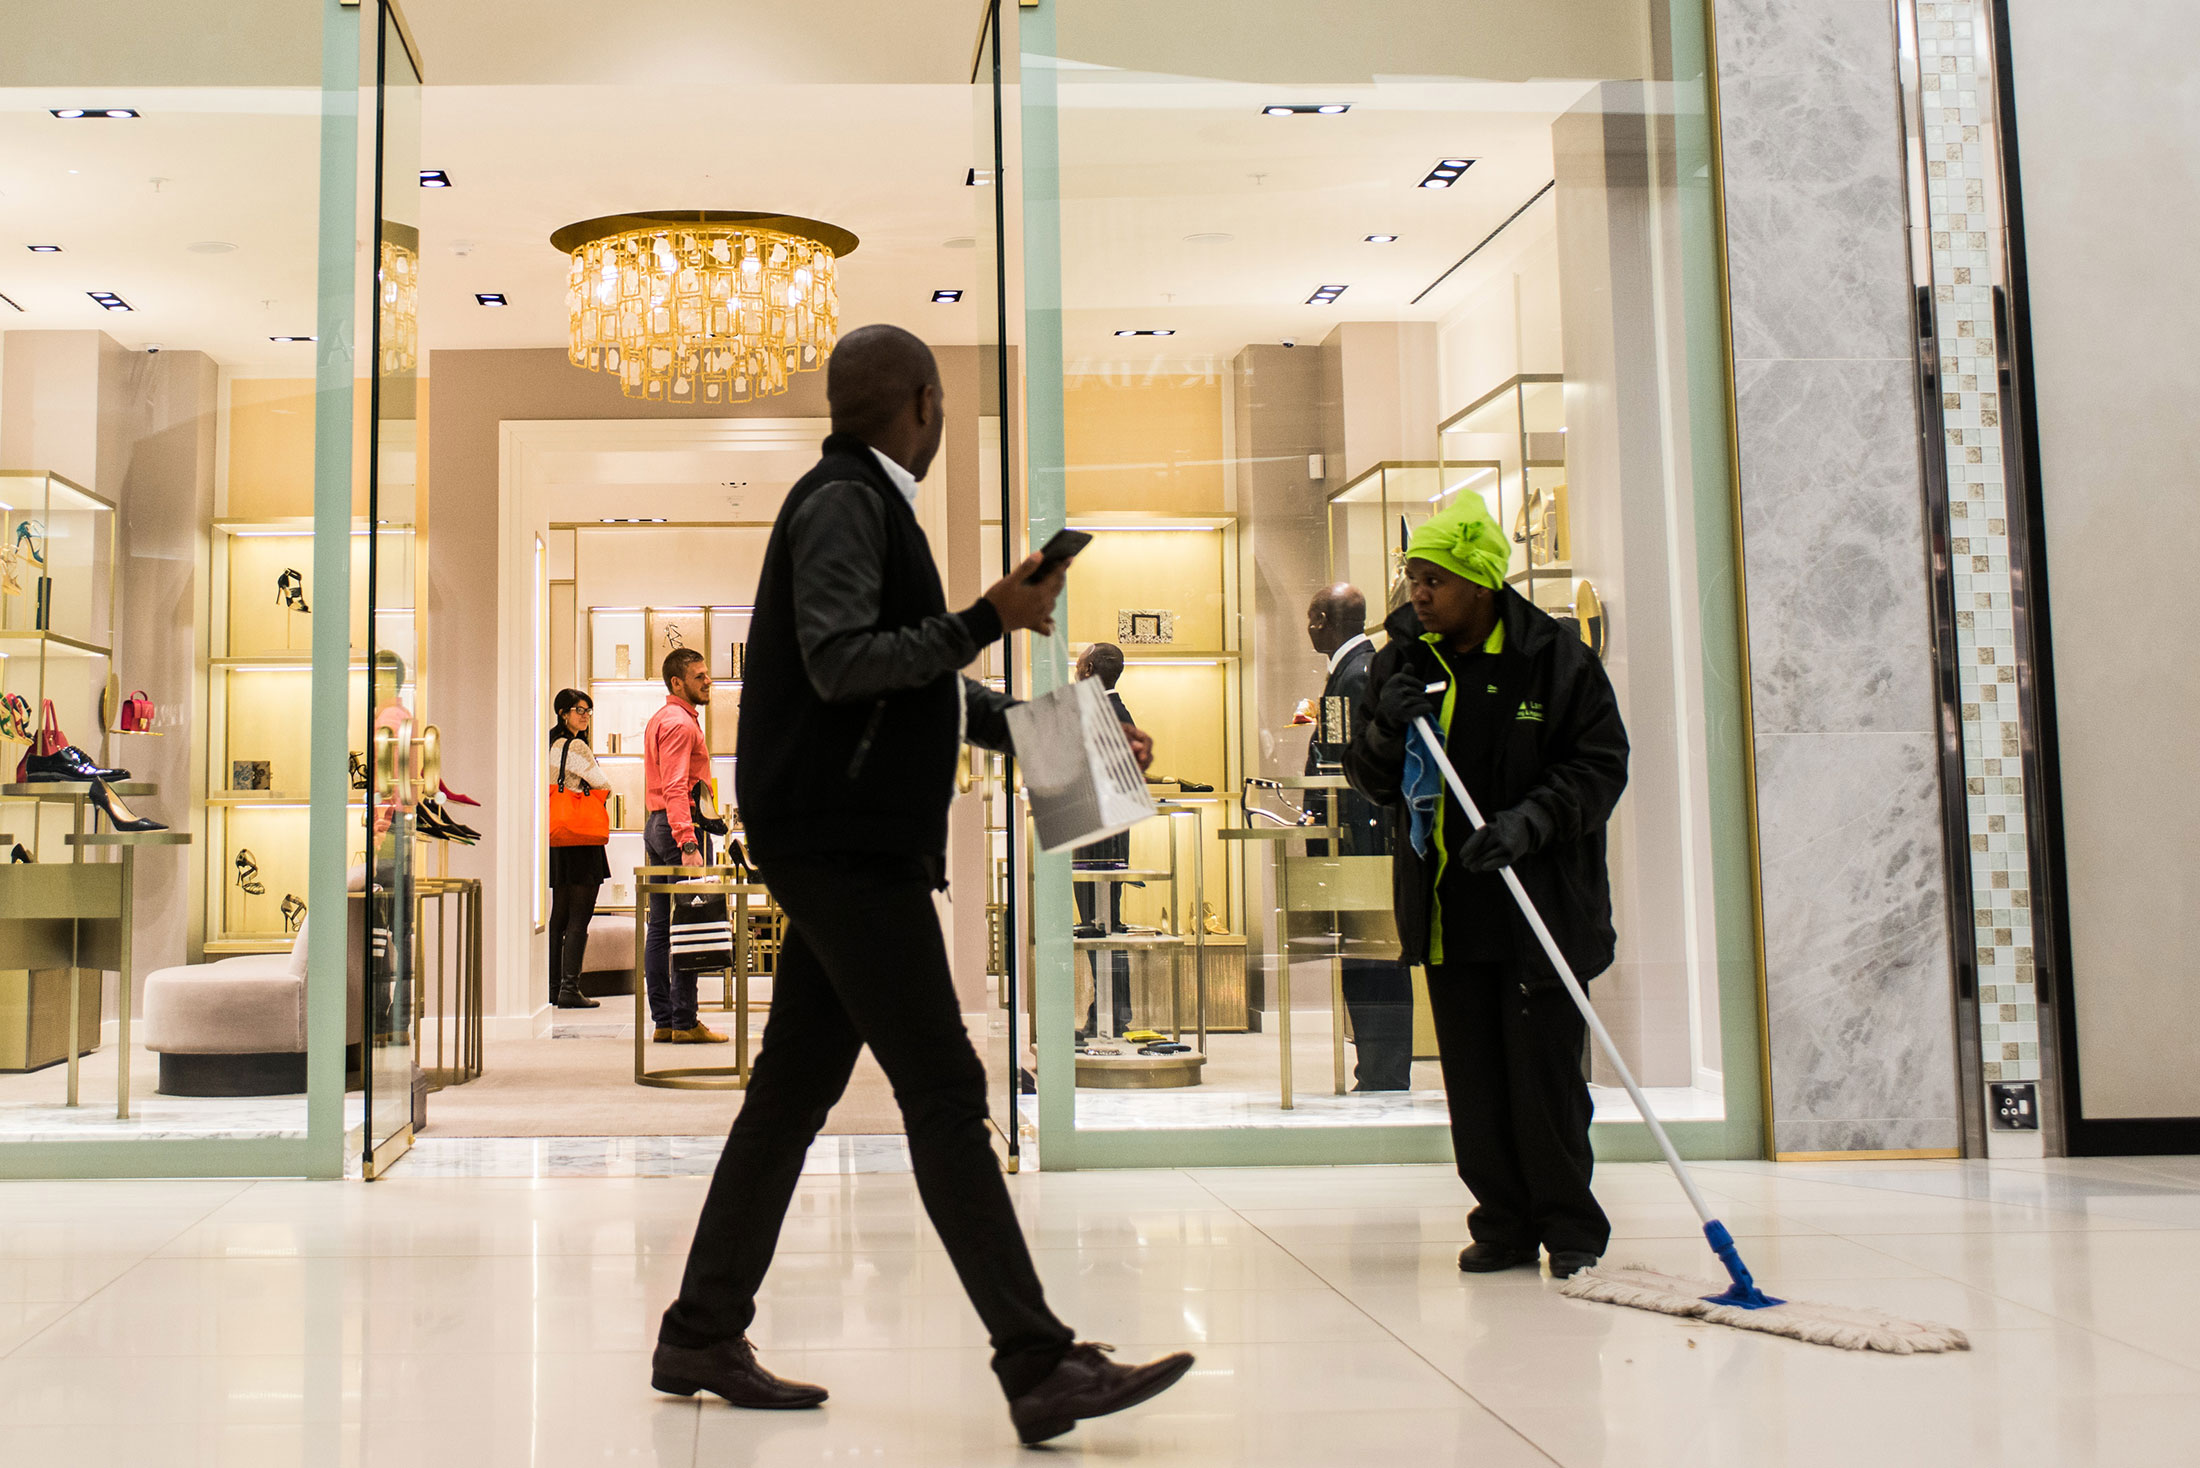 Africa's Diamond Walk Is Home to Prada, Zegna, a Few Buyers